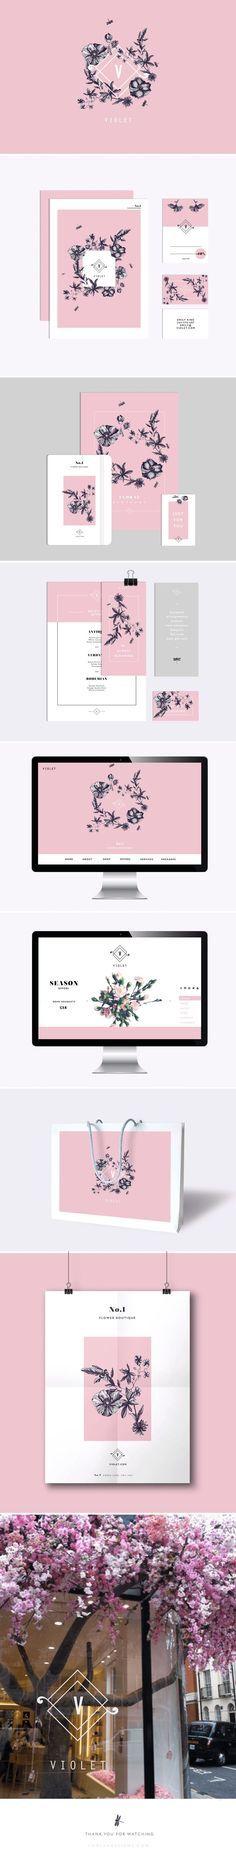 Branding and logo design / hand drawn boho flowers + pink + grey // loolaadesigns.com: http://loolaadesigns.comviolet-branding/?utm_content=bufferd9ea2&utm_medium=social&utm_source=pinterest.com&utm_campaign=buffer